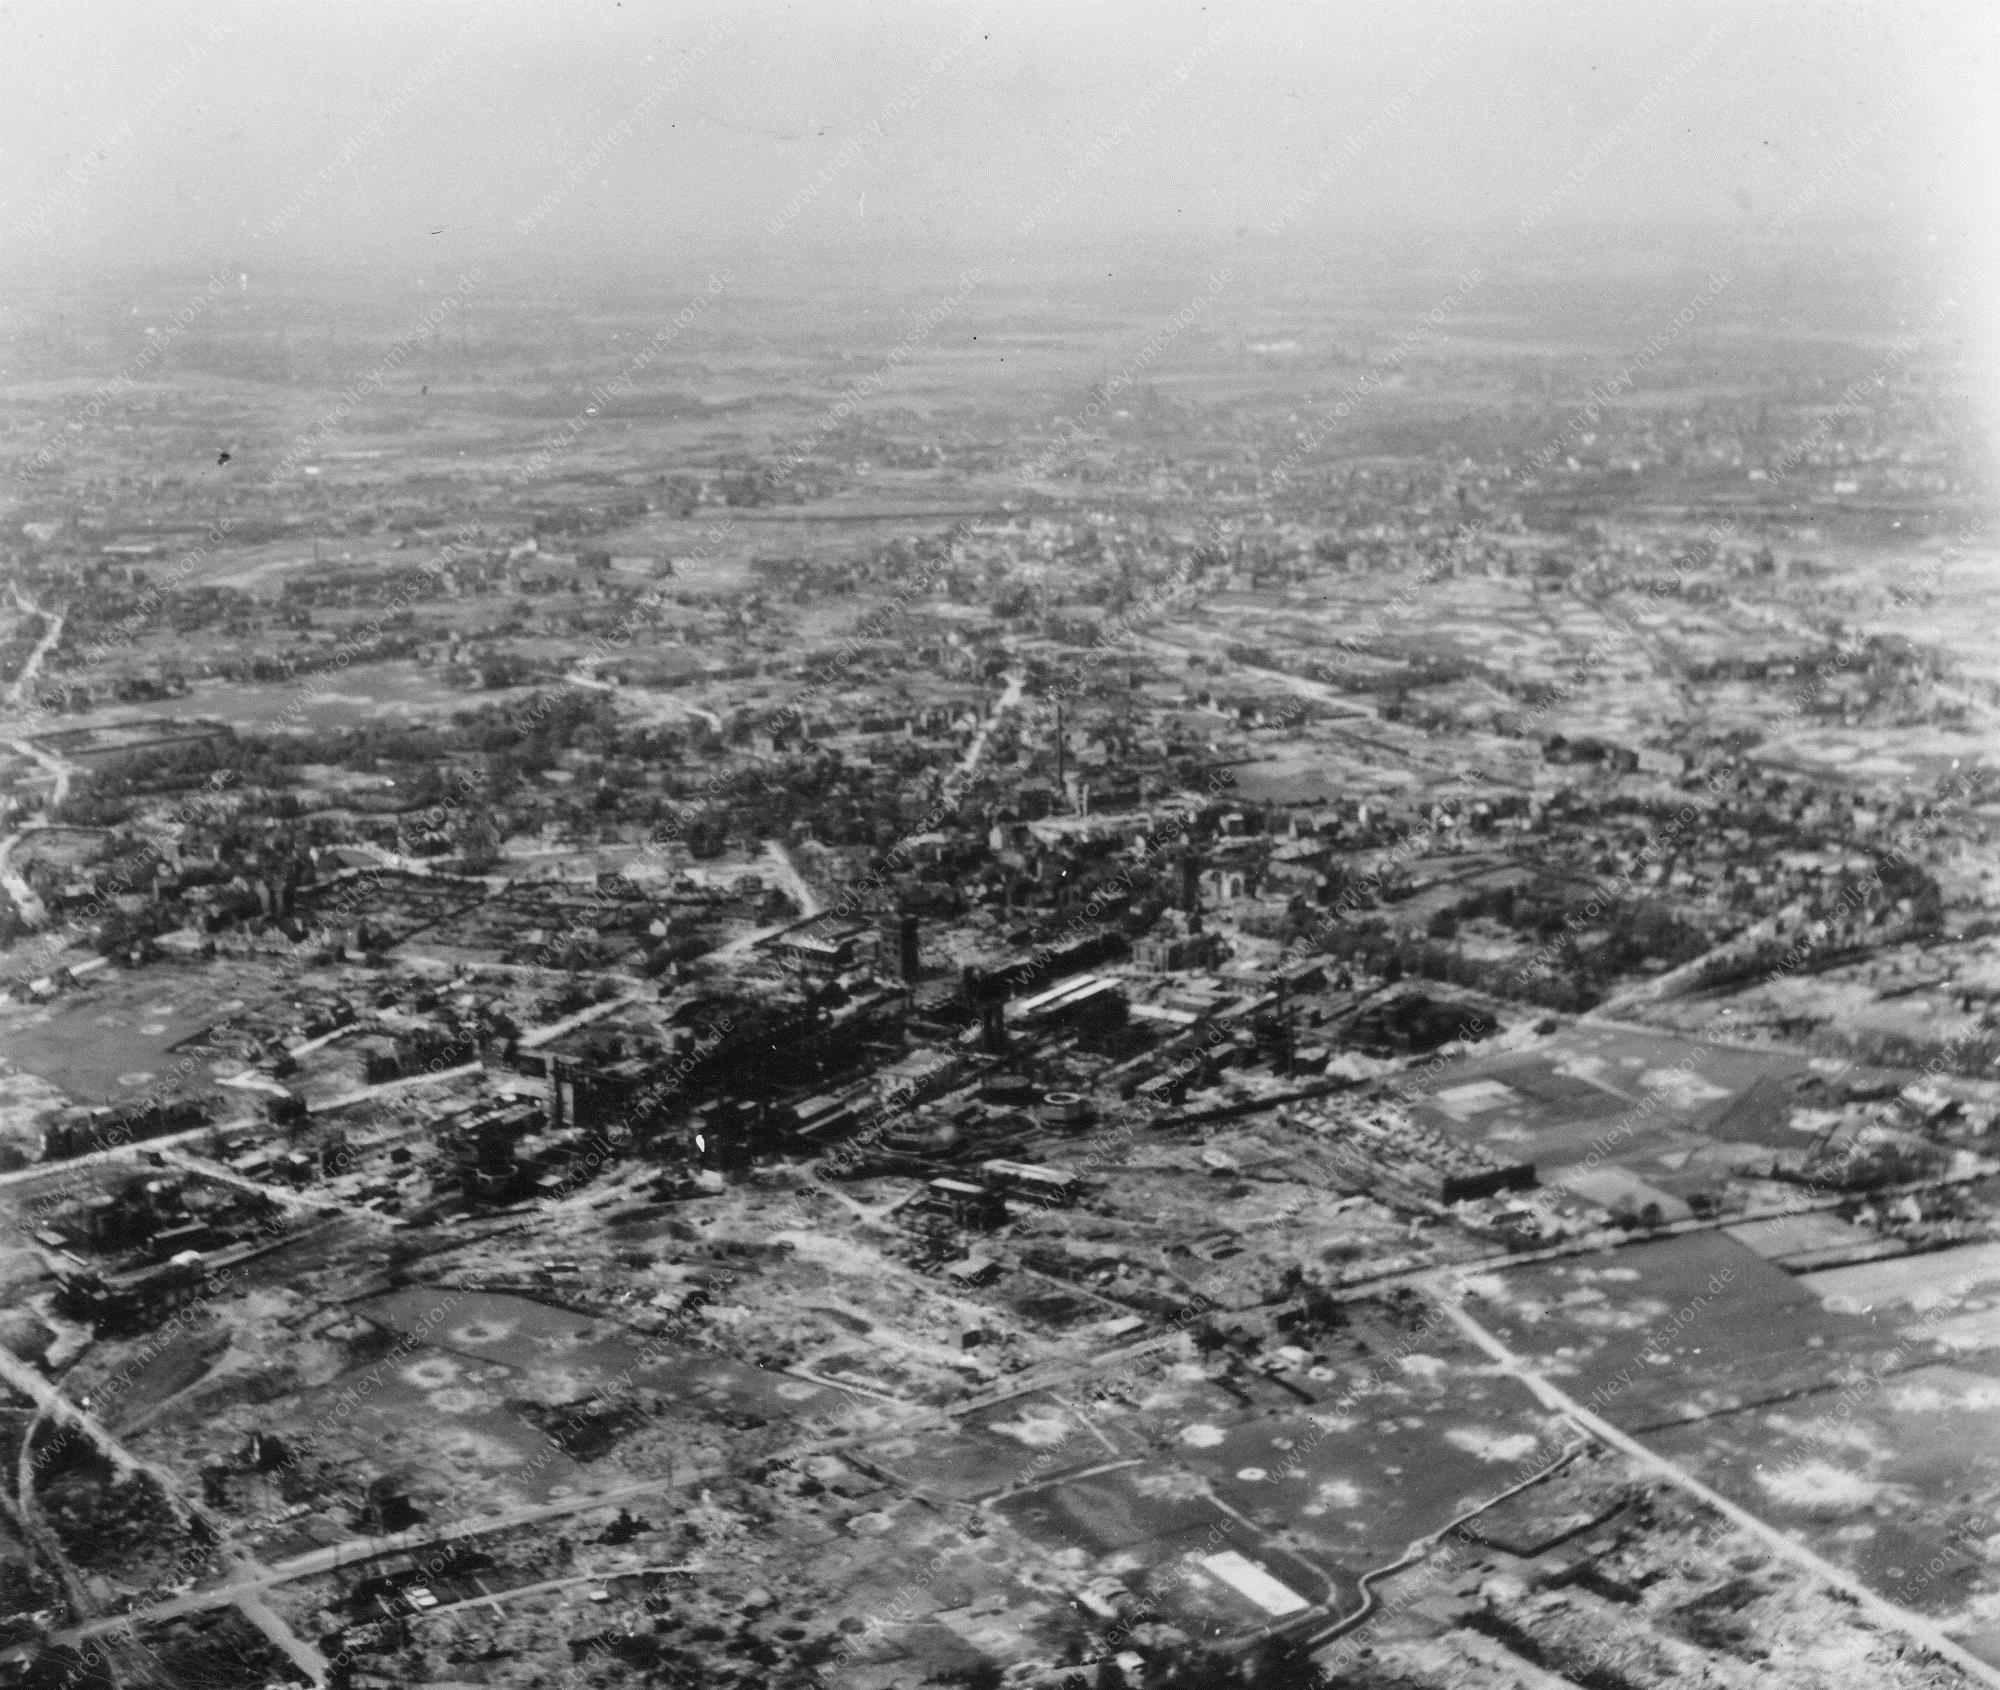 Zeche Hannibal in Bochum-Hofstede Luftbild aus dem Zweiten Weltkrieg